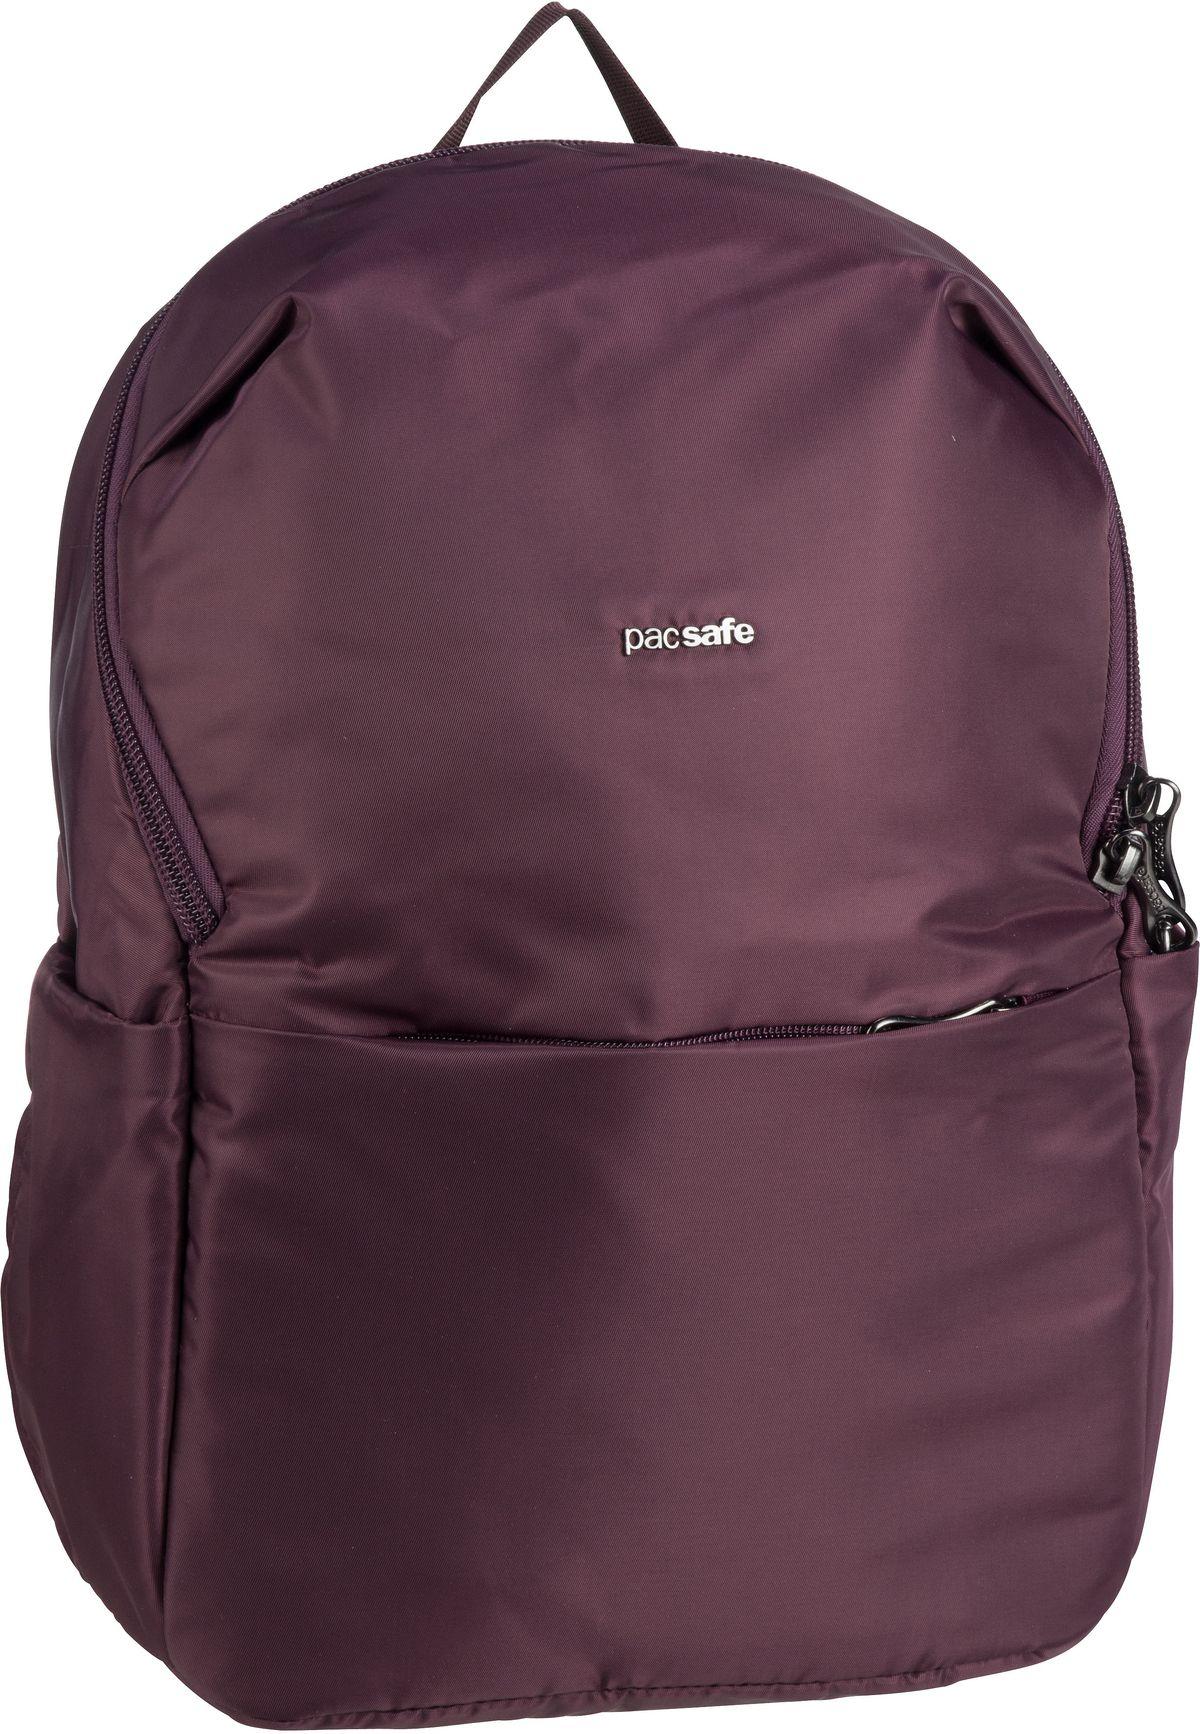 Rucksack / Daypack Cruise essentials Backpack Pinot (12 Liter)